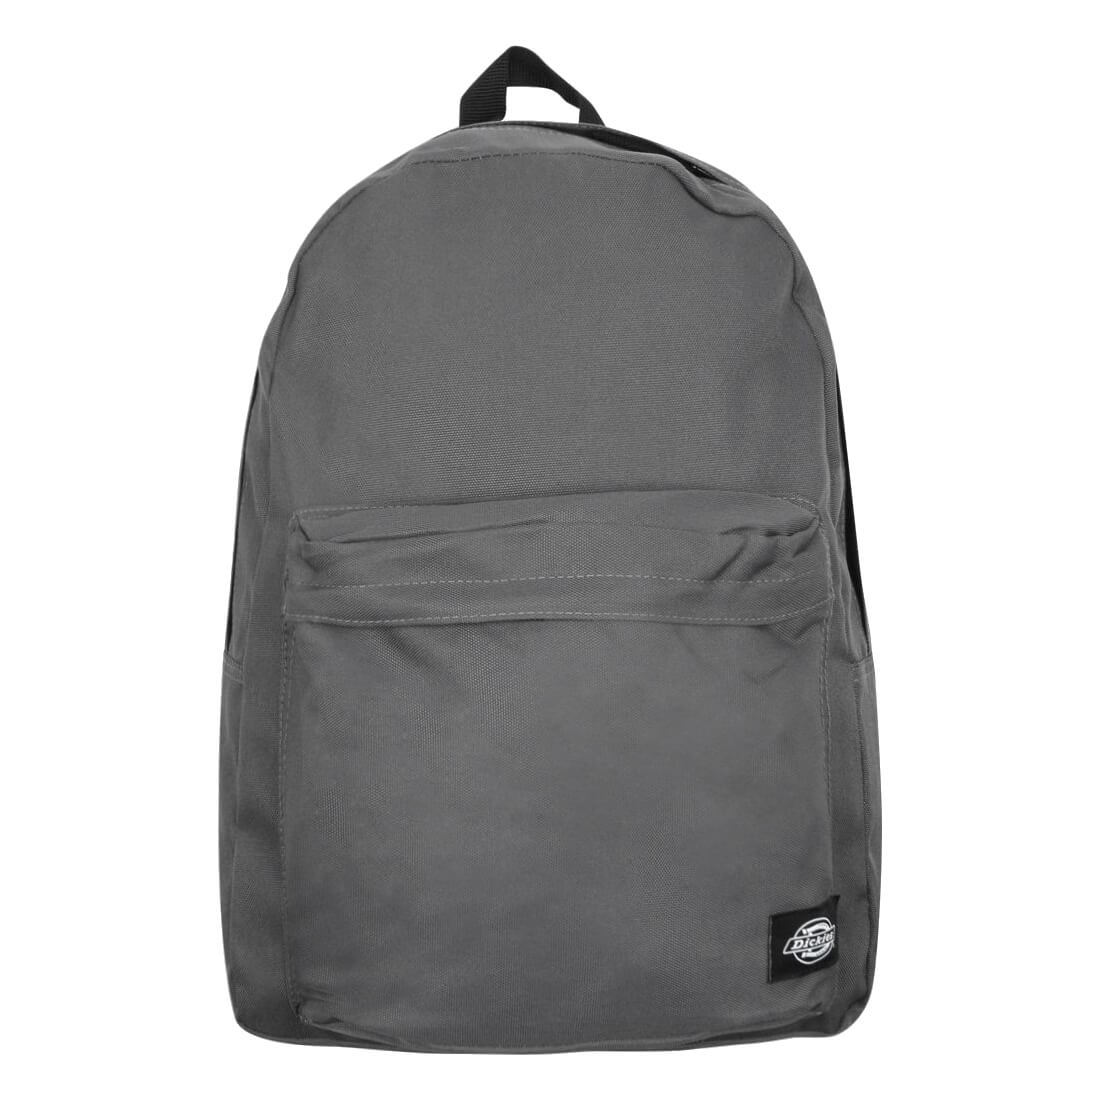 Рюкзак DICKIES Indianapolis (Charcoal Grey)